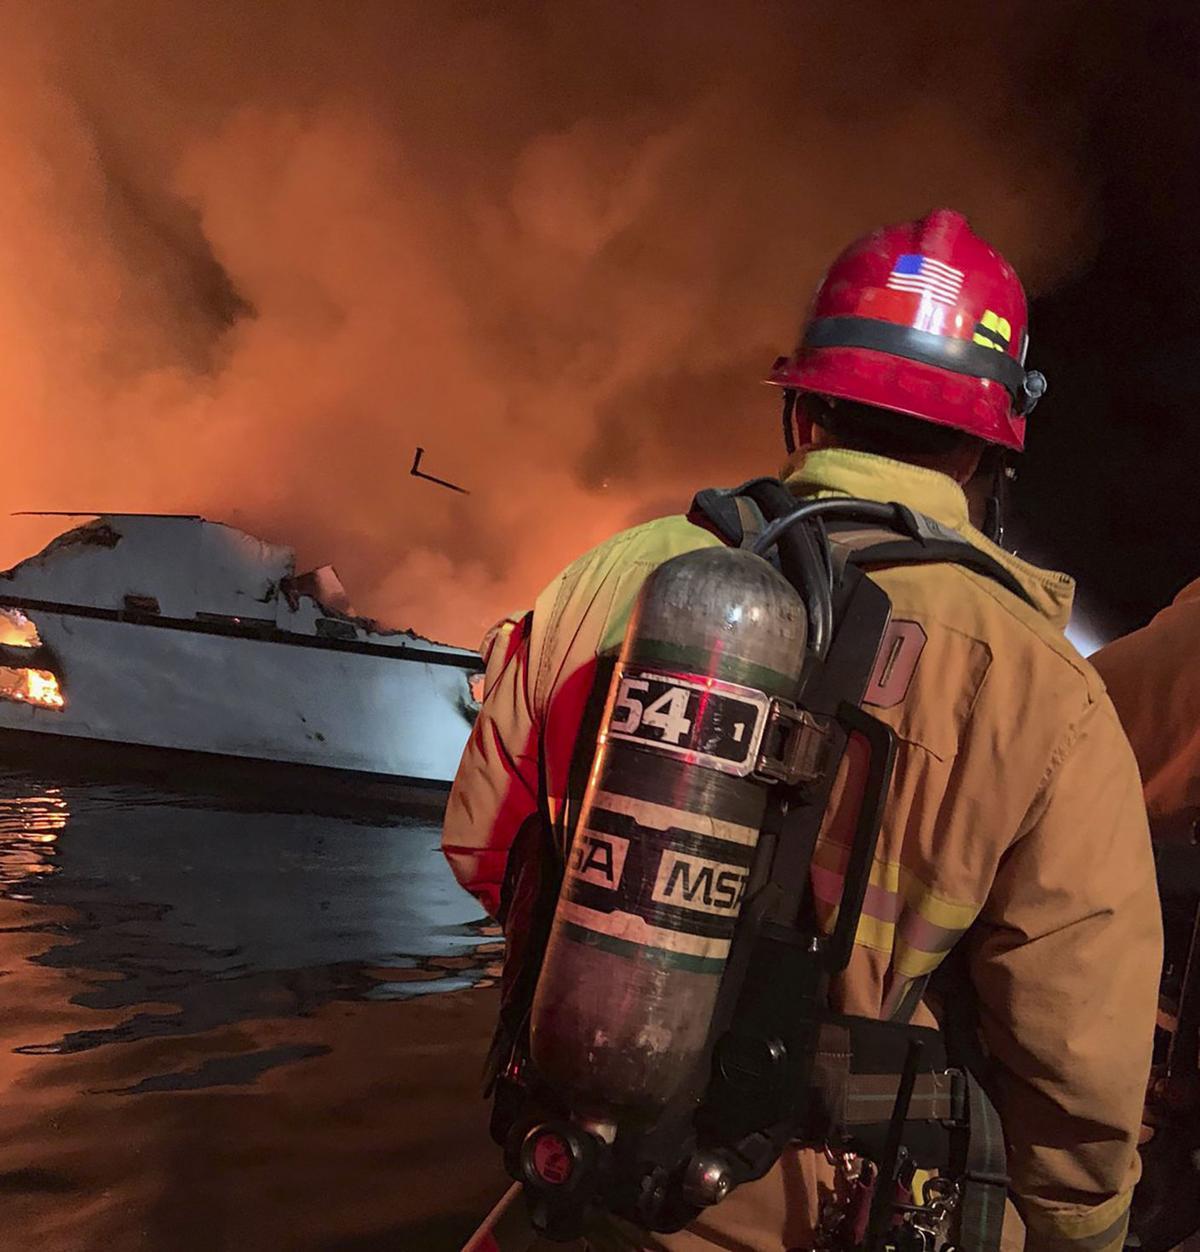 Haunting Distress Calls as Fire Engulfs Scuba Boat; 25 Are Reported Dead